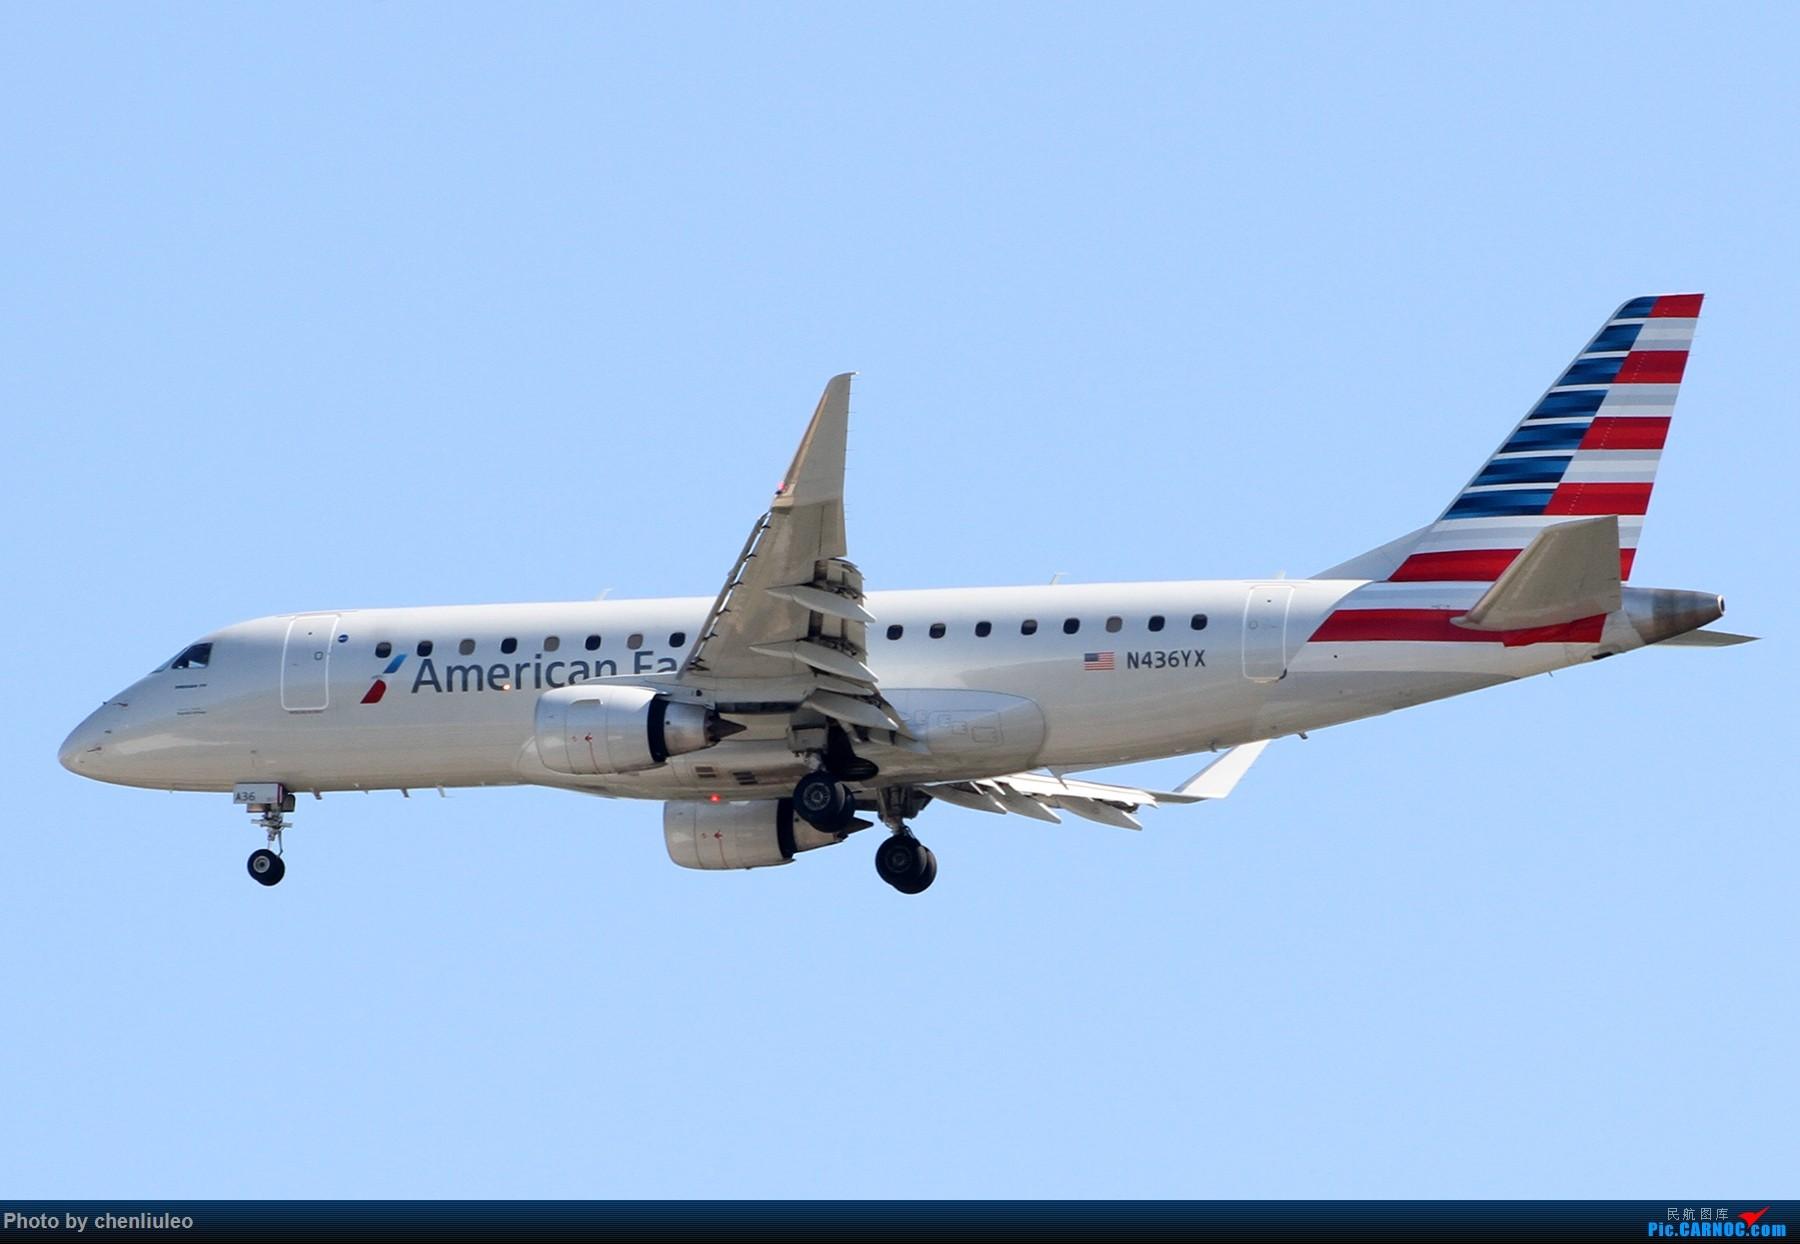 Re:【北美飞友会】本来是去等西南航空的新加州一号彩绘 结果有意外惊喜 美军C-40C EMBRAER E175 N436YX 美国圣路易斯机场